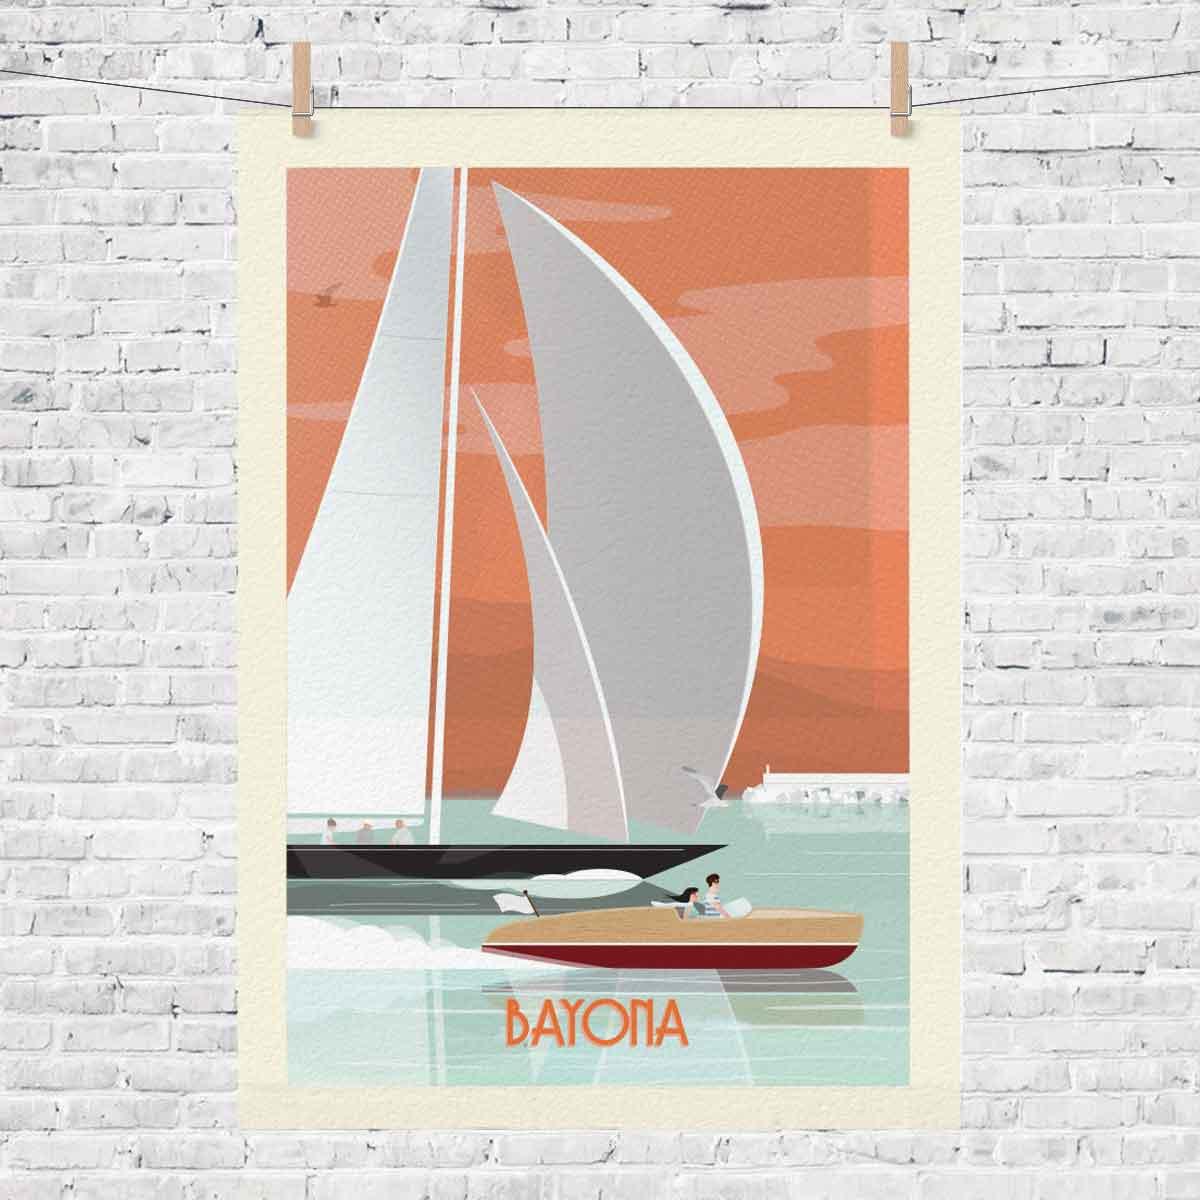 baiona_bayona_lamina_barcos_camiseta_regalo_bayprints_souvinir_shop_tienda_souvenirs_baiona_souvenart_shop